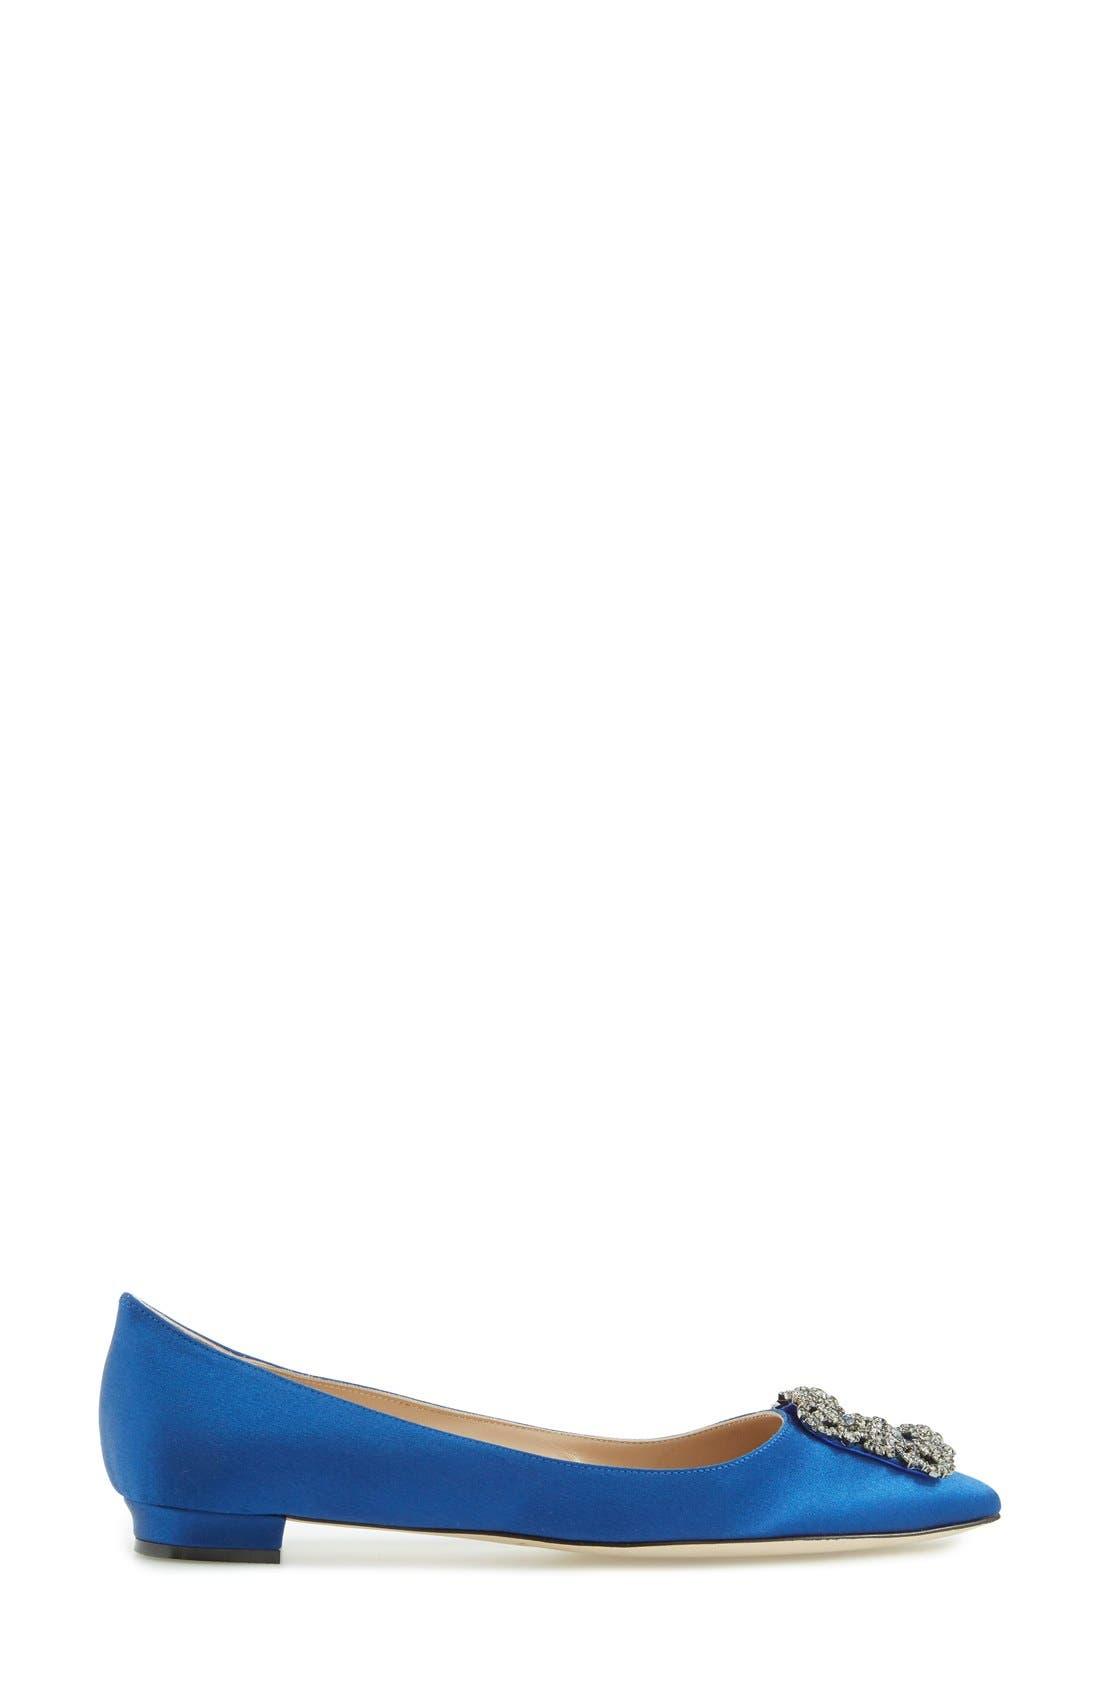 Hangisi Flat,                             Alternate thumbnail 4, color,                             BLUE SATIN